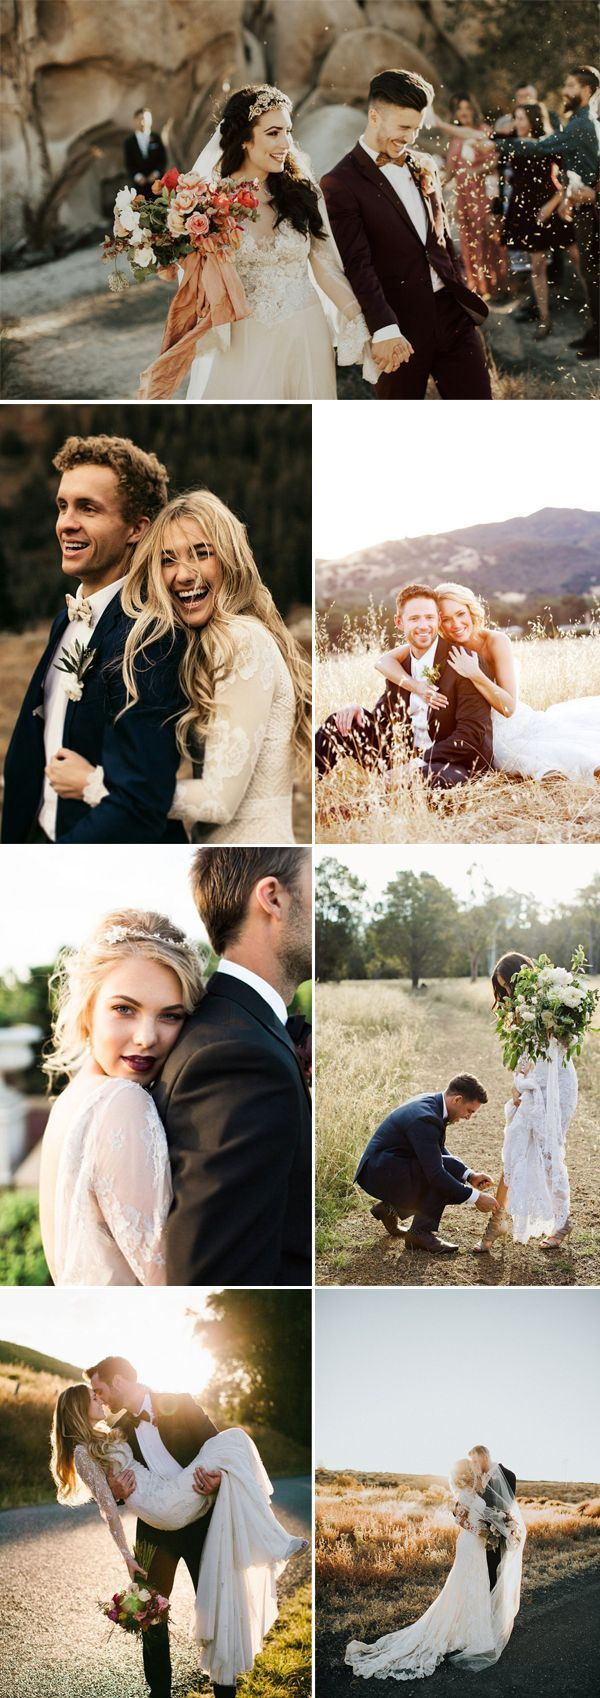 37 elegant wedding photos that you want to marry – Wedding ideas